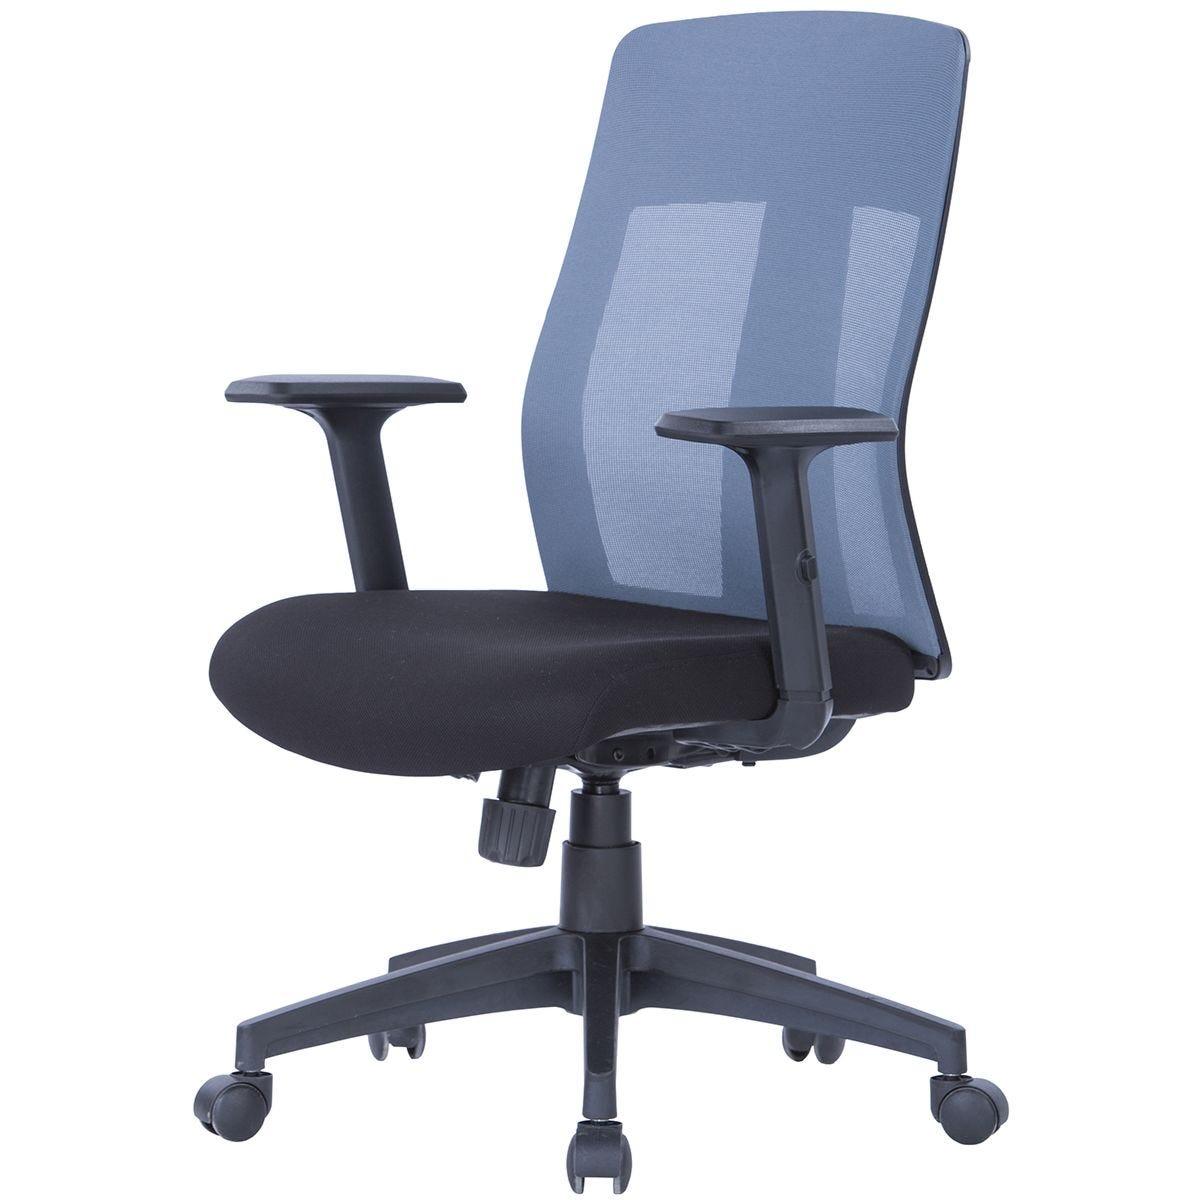 Alphason Laguna Chair - Grey